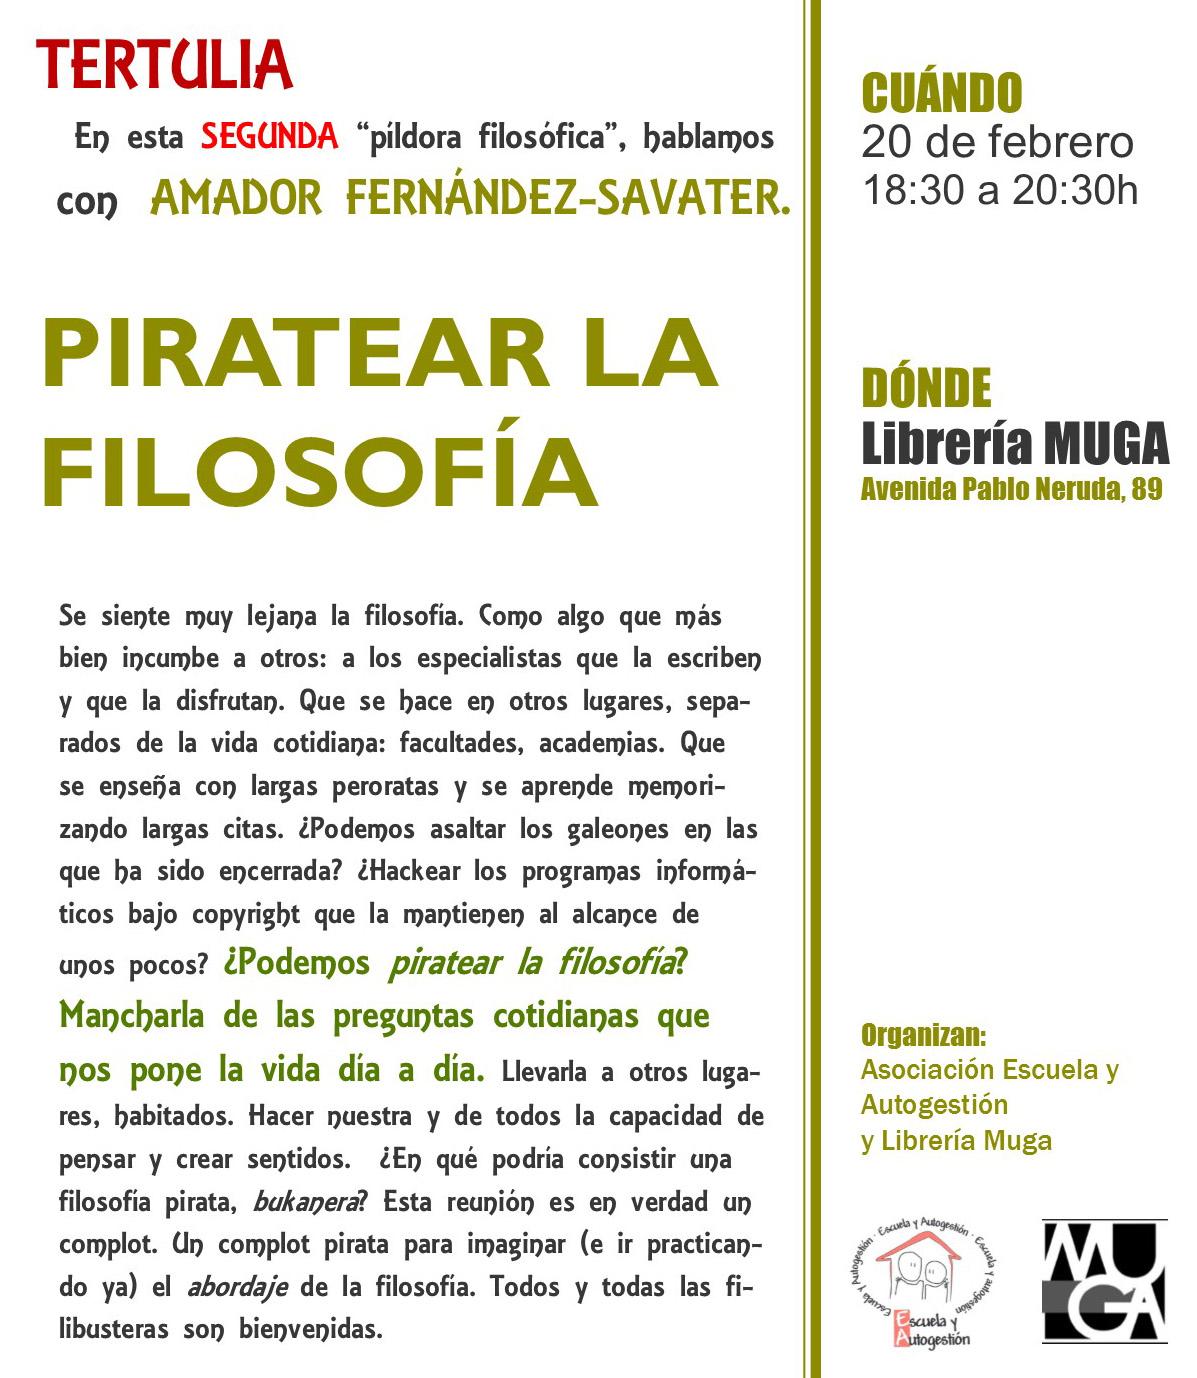 """Piratear la filosofía"" con Amador Fernández-Savater"